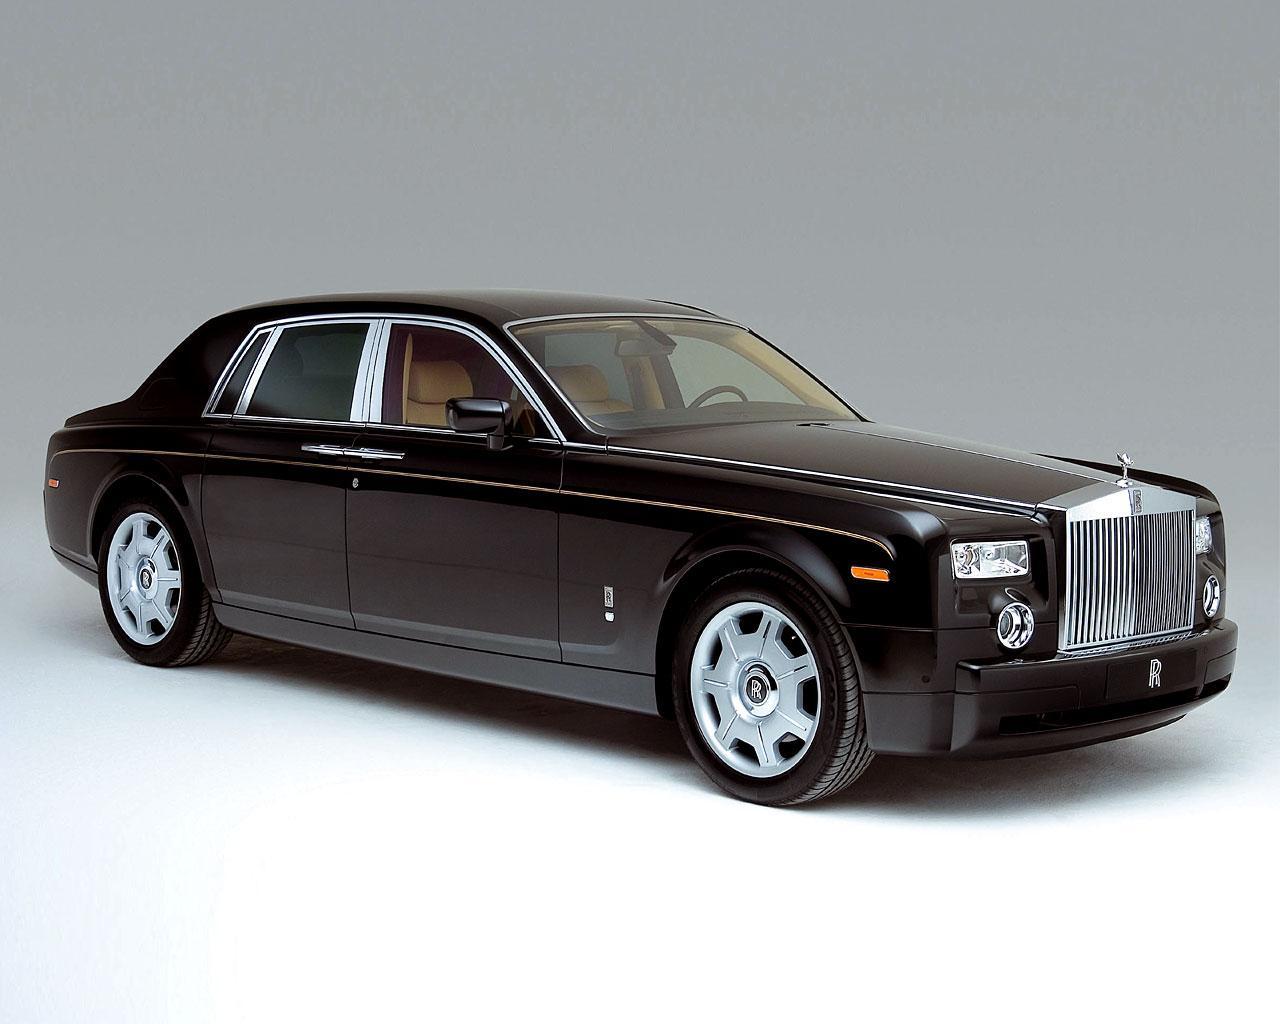 Rolls Royce Phantom 48 Free Car Wallpaper